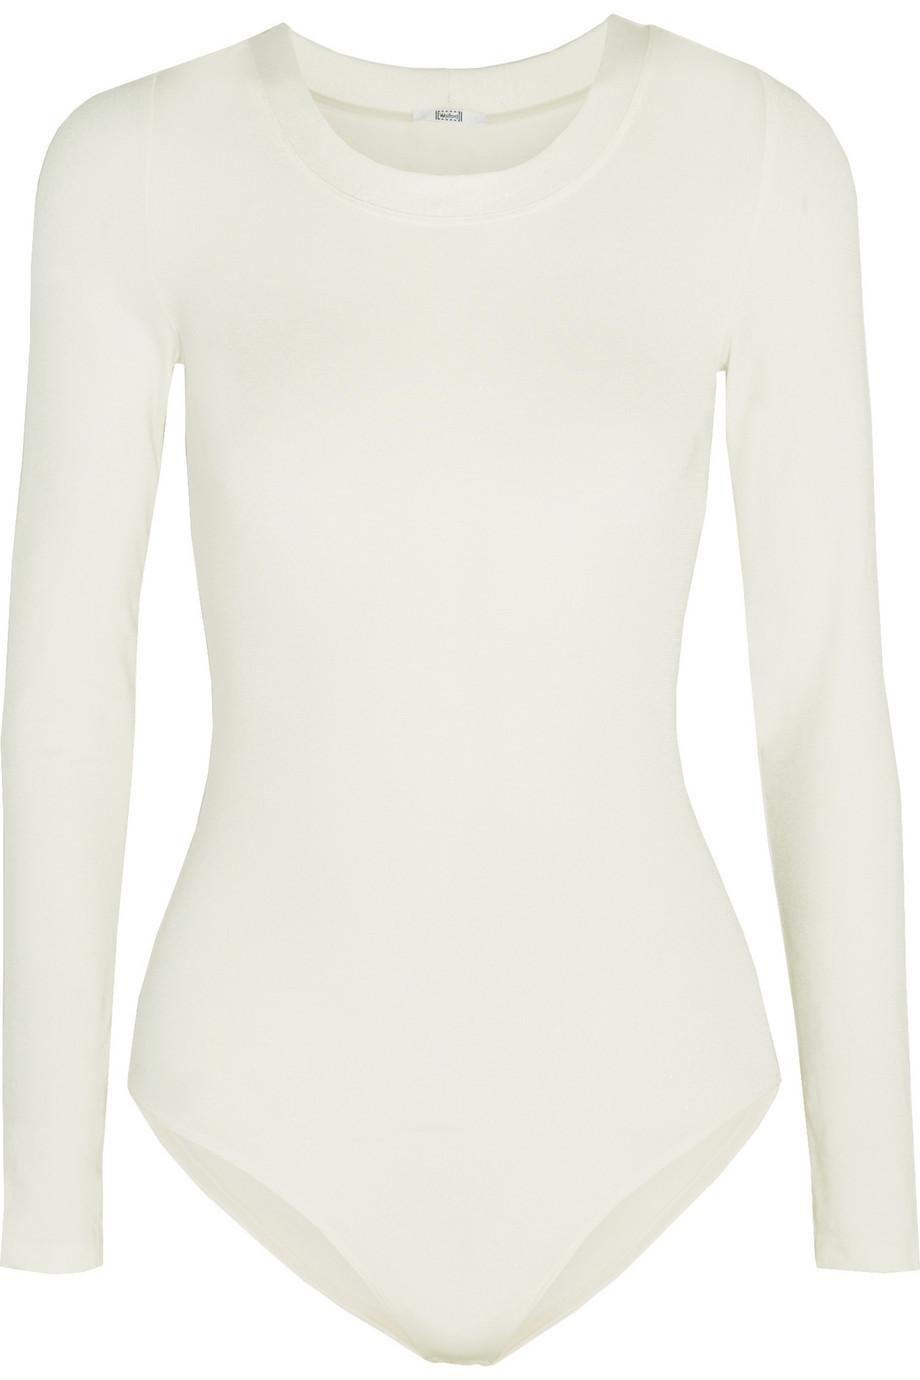 Wolford Berlin Stretch-Jersey Bodysuit in ecru